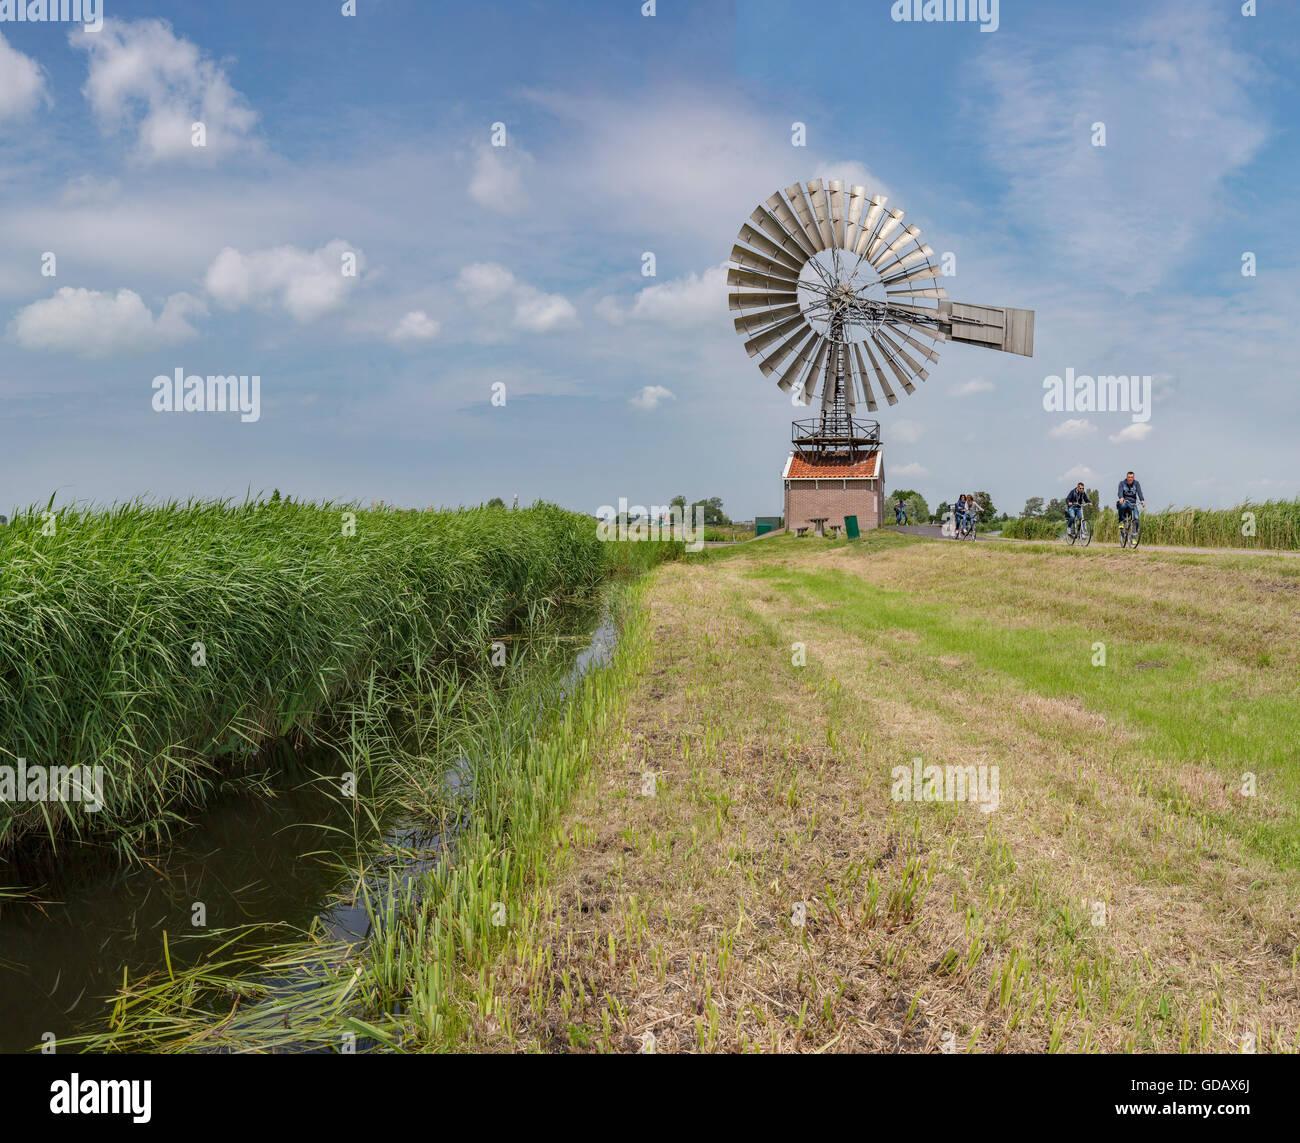 Zaandam,Noord-Holland,The metal American wind turbine Hercules - Stock Image